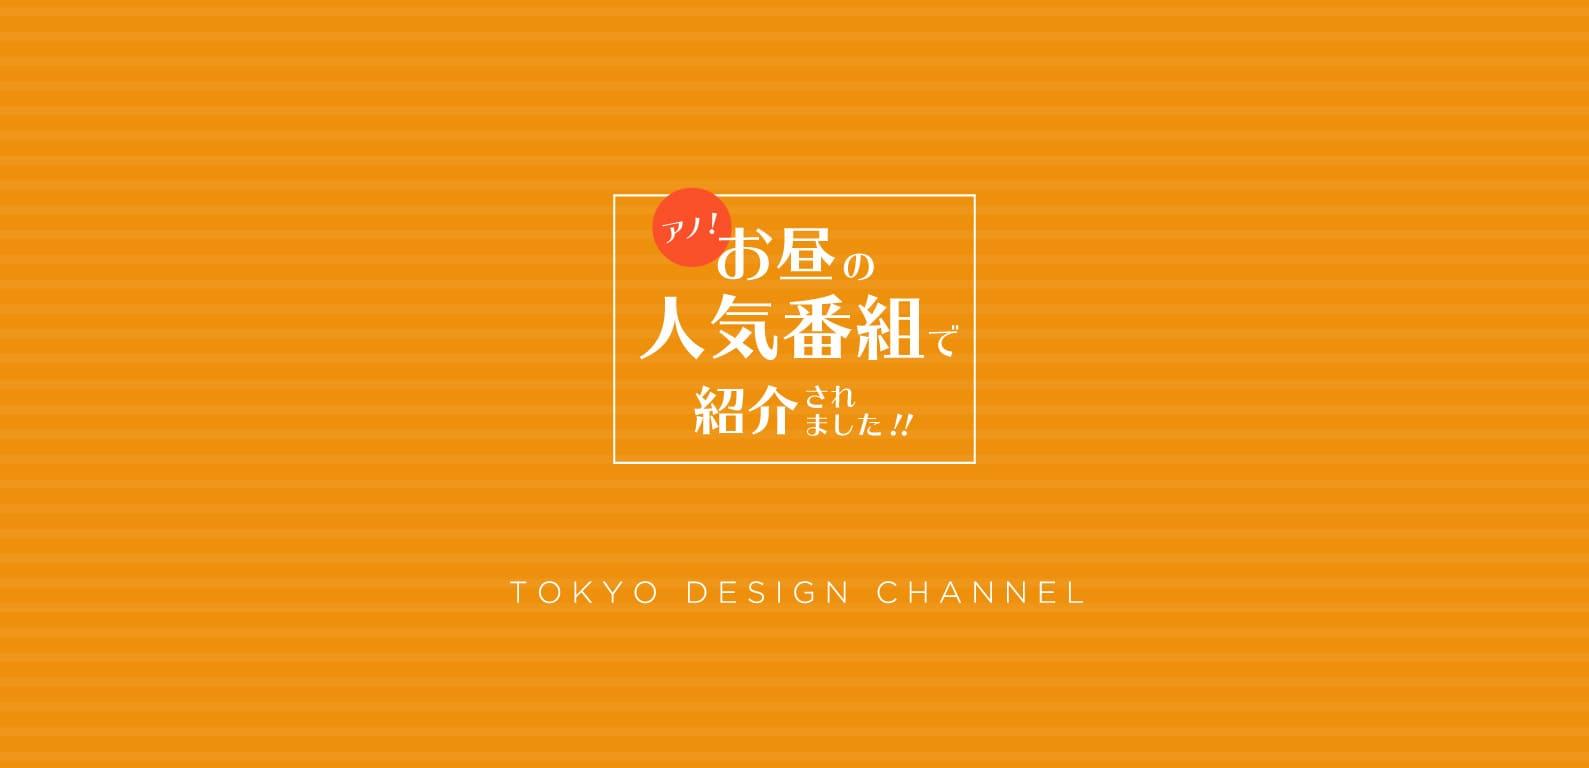 TDC | TVで紹介されたアイテムを一挙大公開!